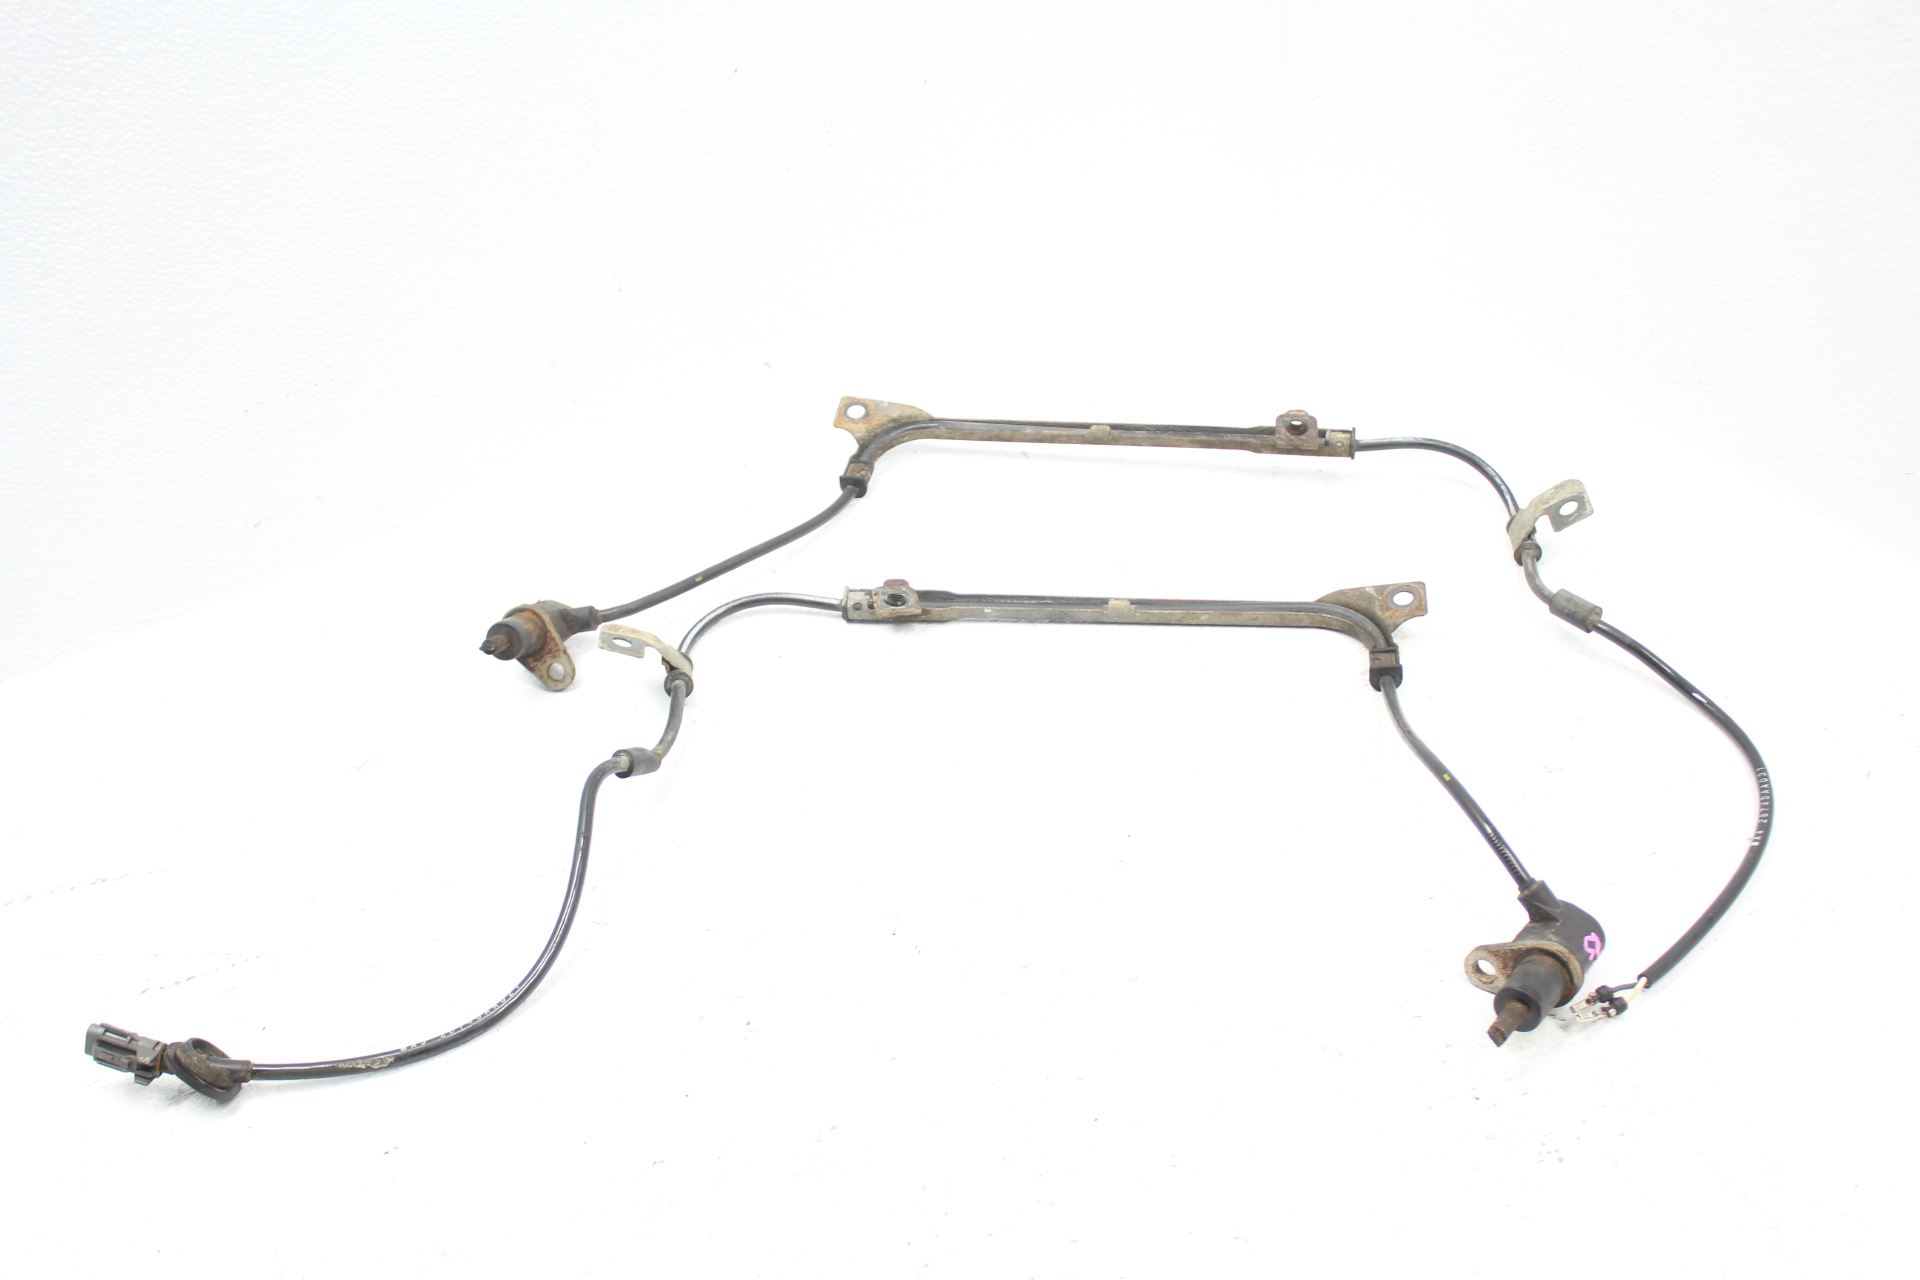 1998-2001 SUBARU IMPREZA 2.5 RS GC8 REAR ABS SENSORS LH/RH